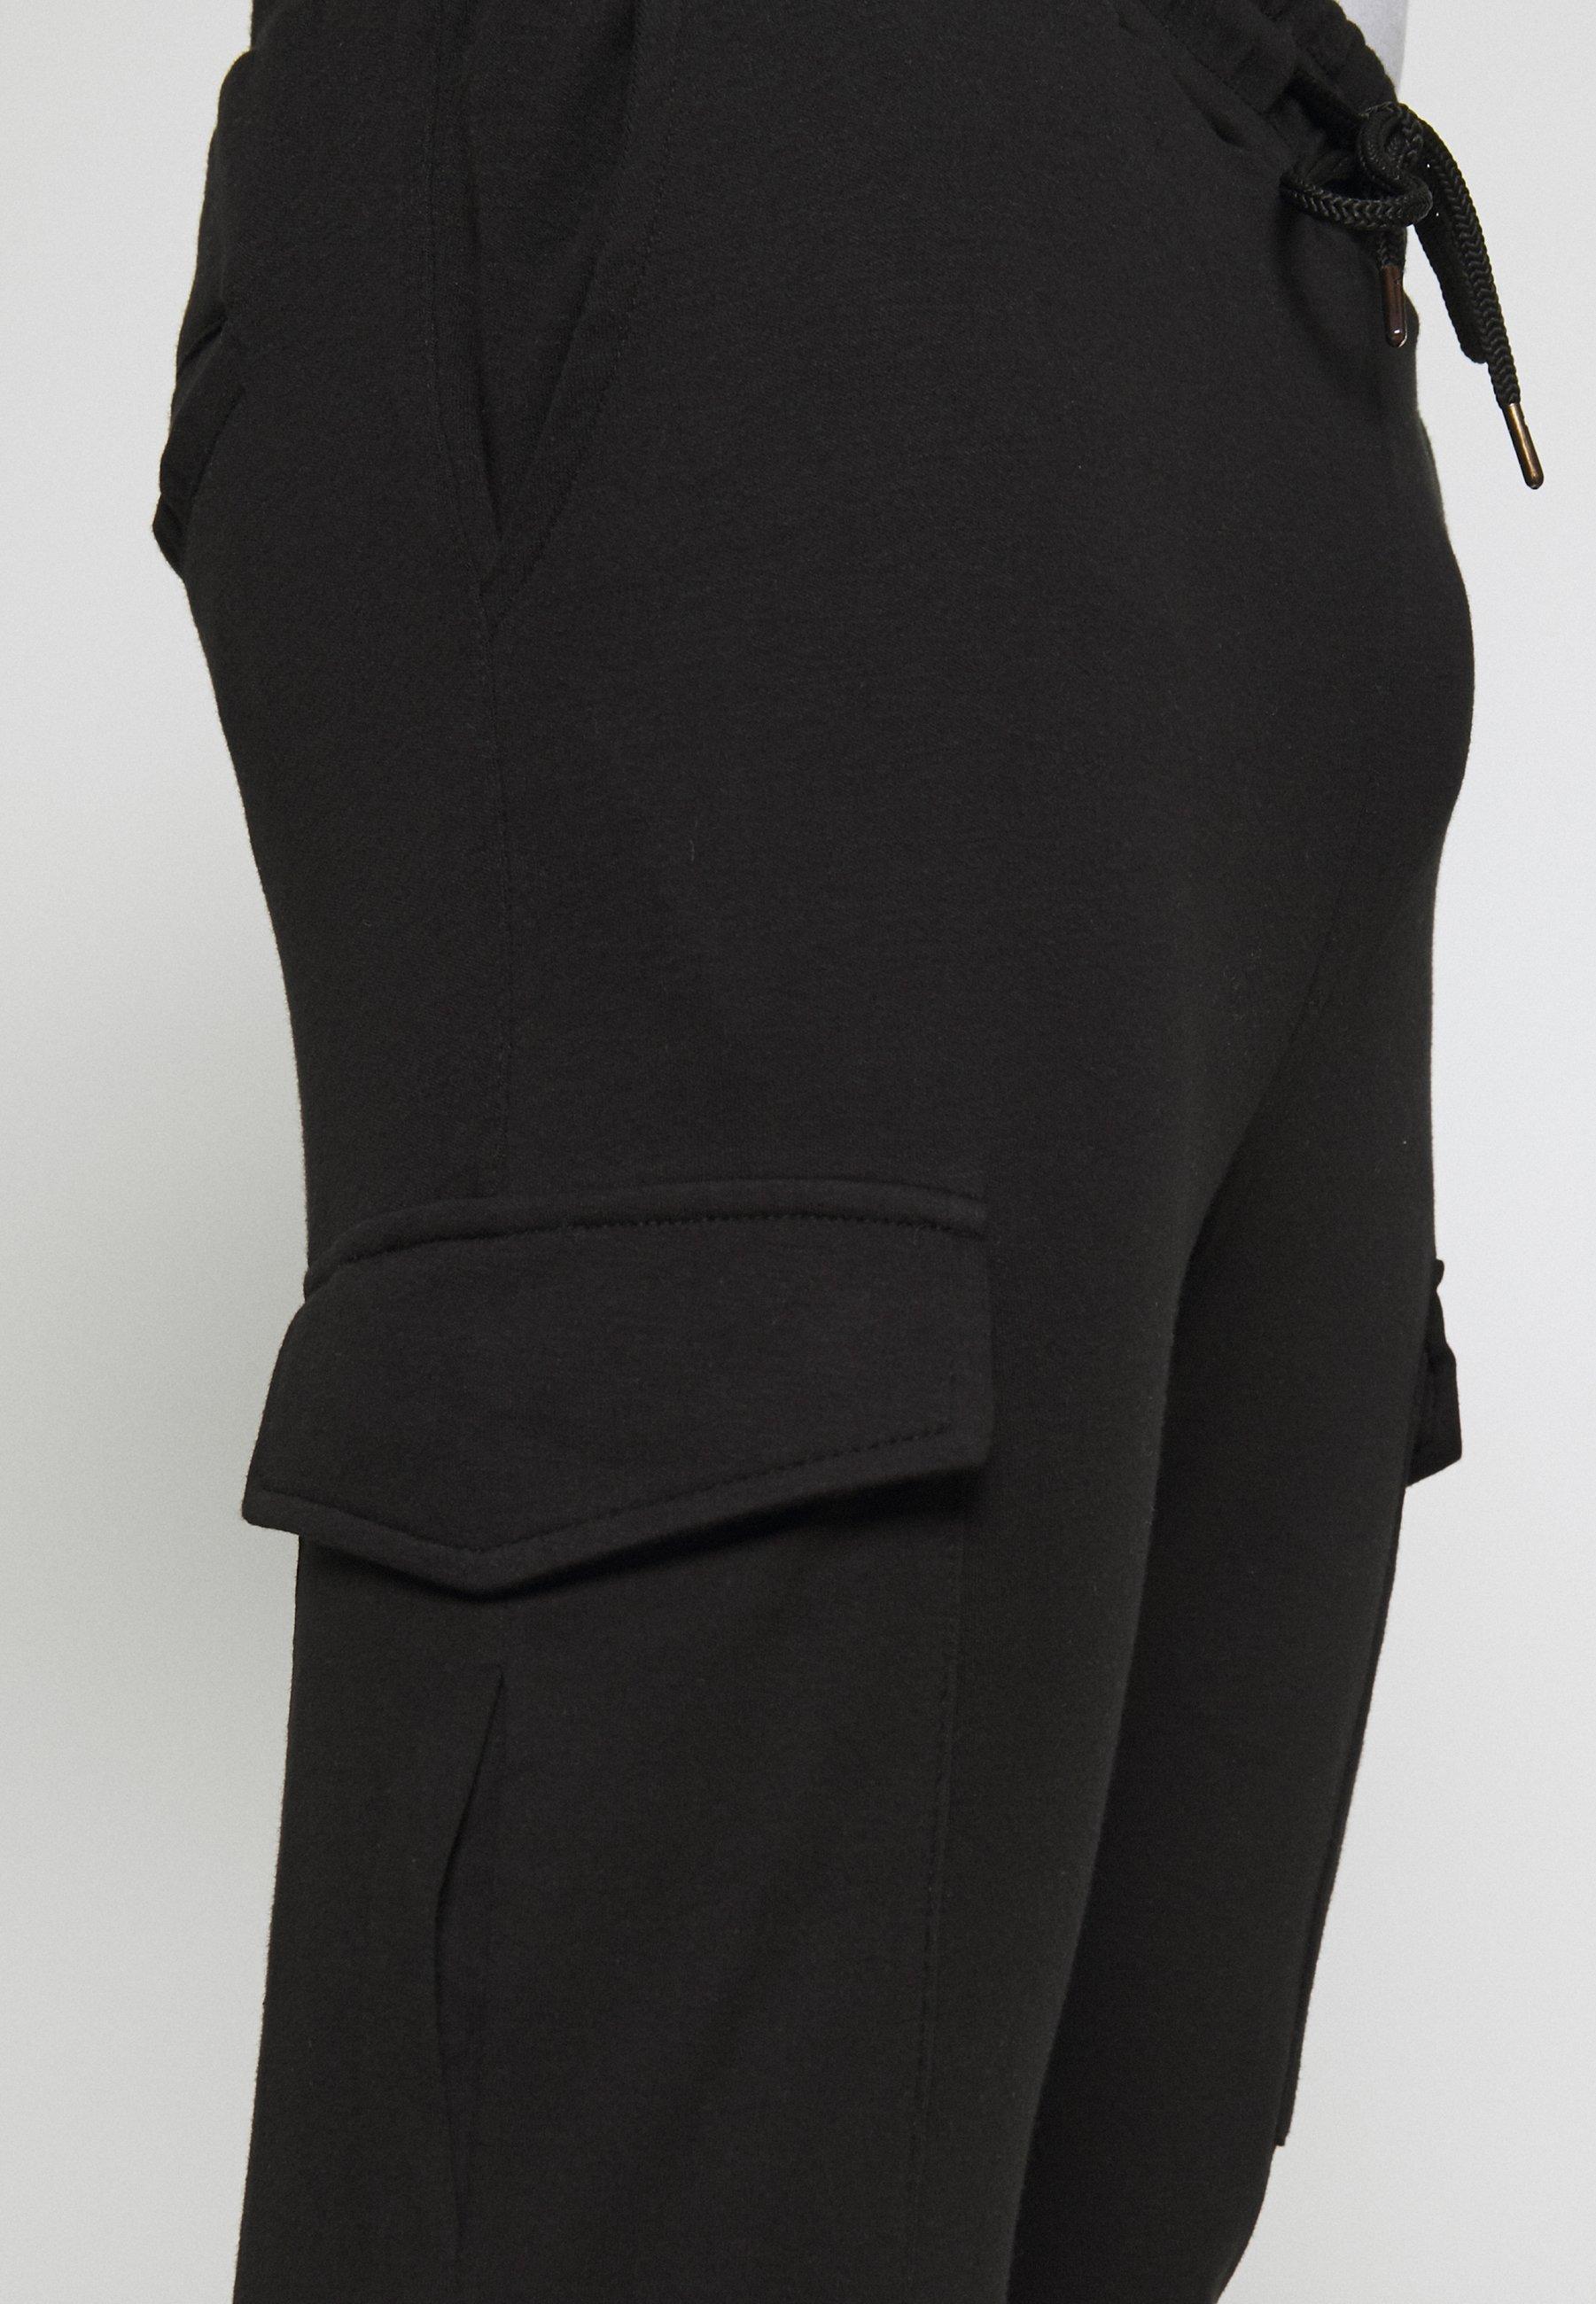 Homme ROCKERPLAIN - Pantalon cargo